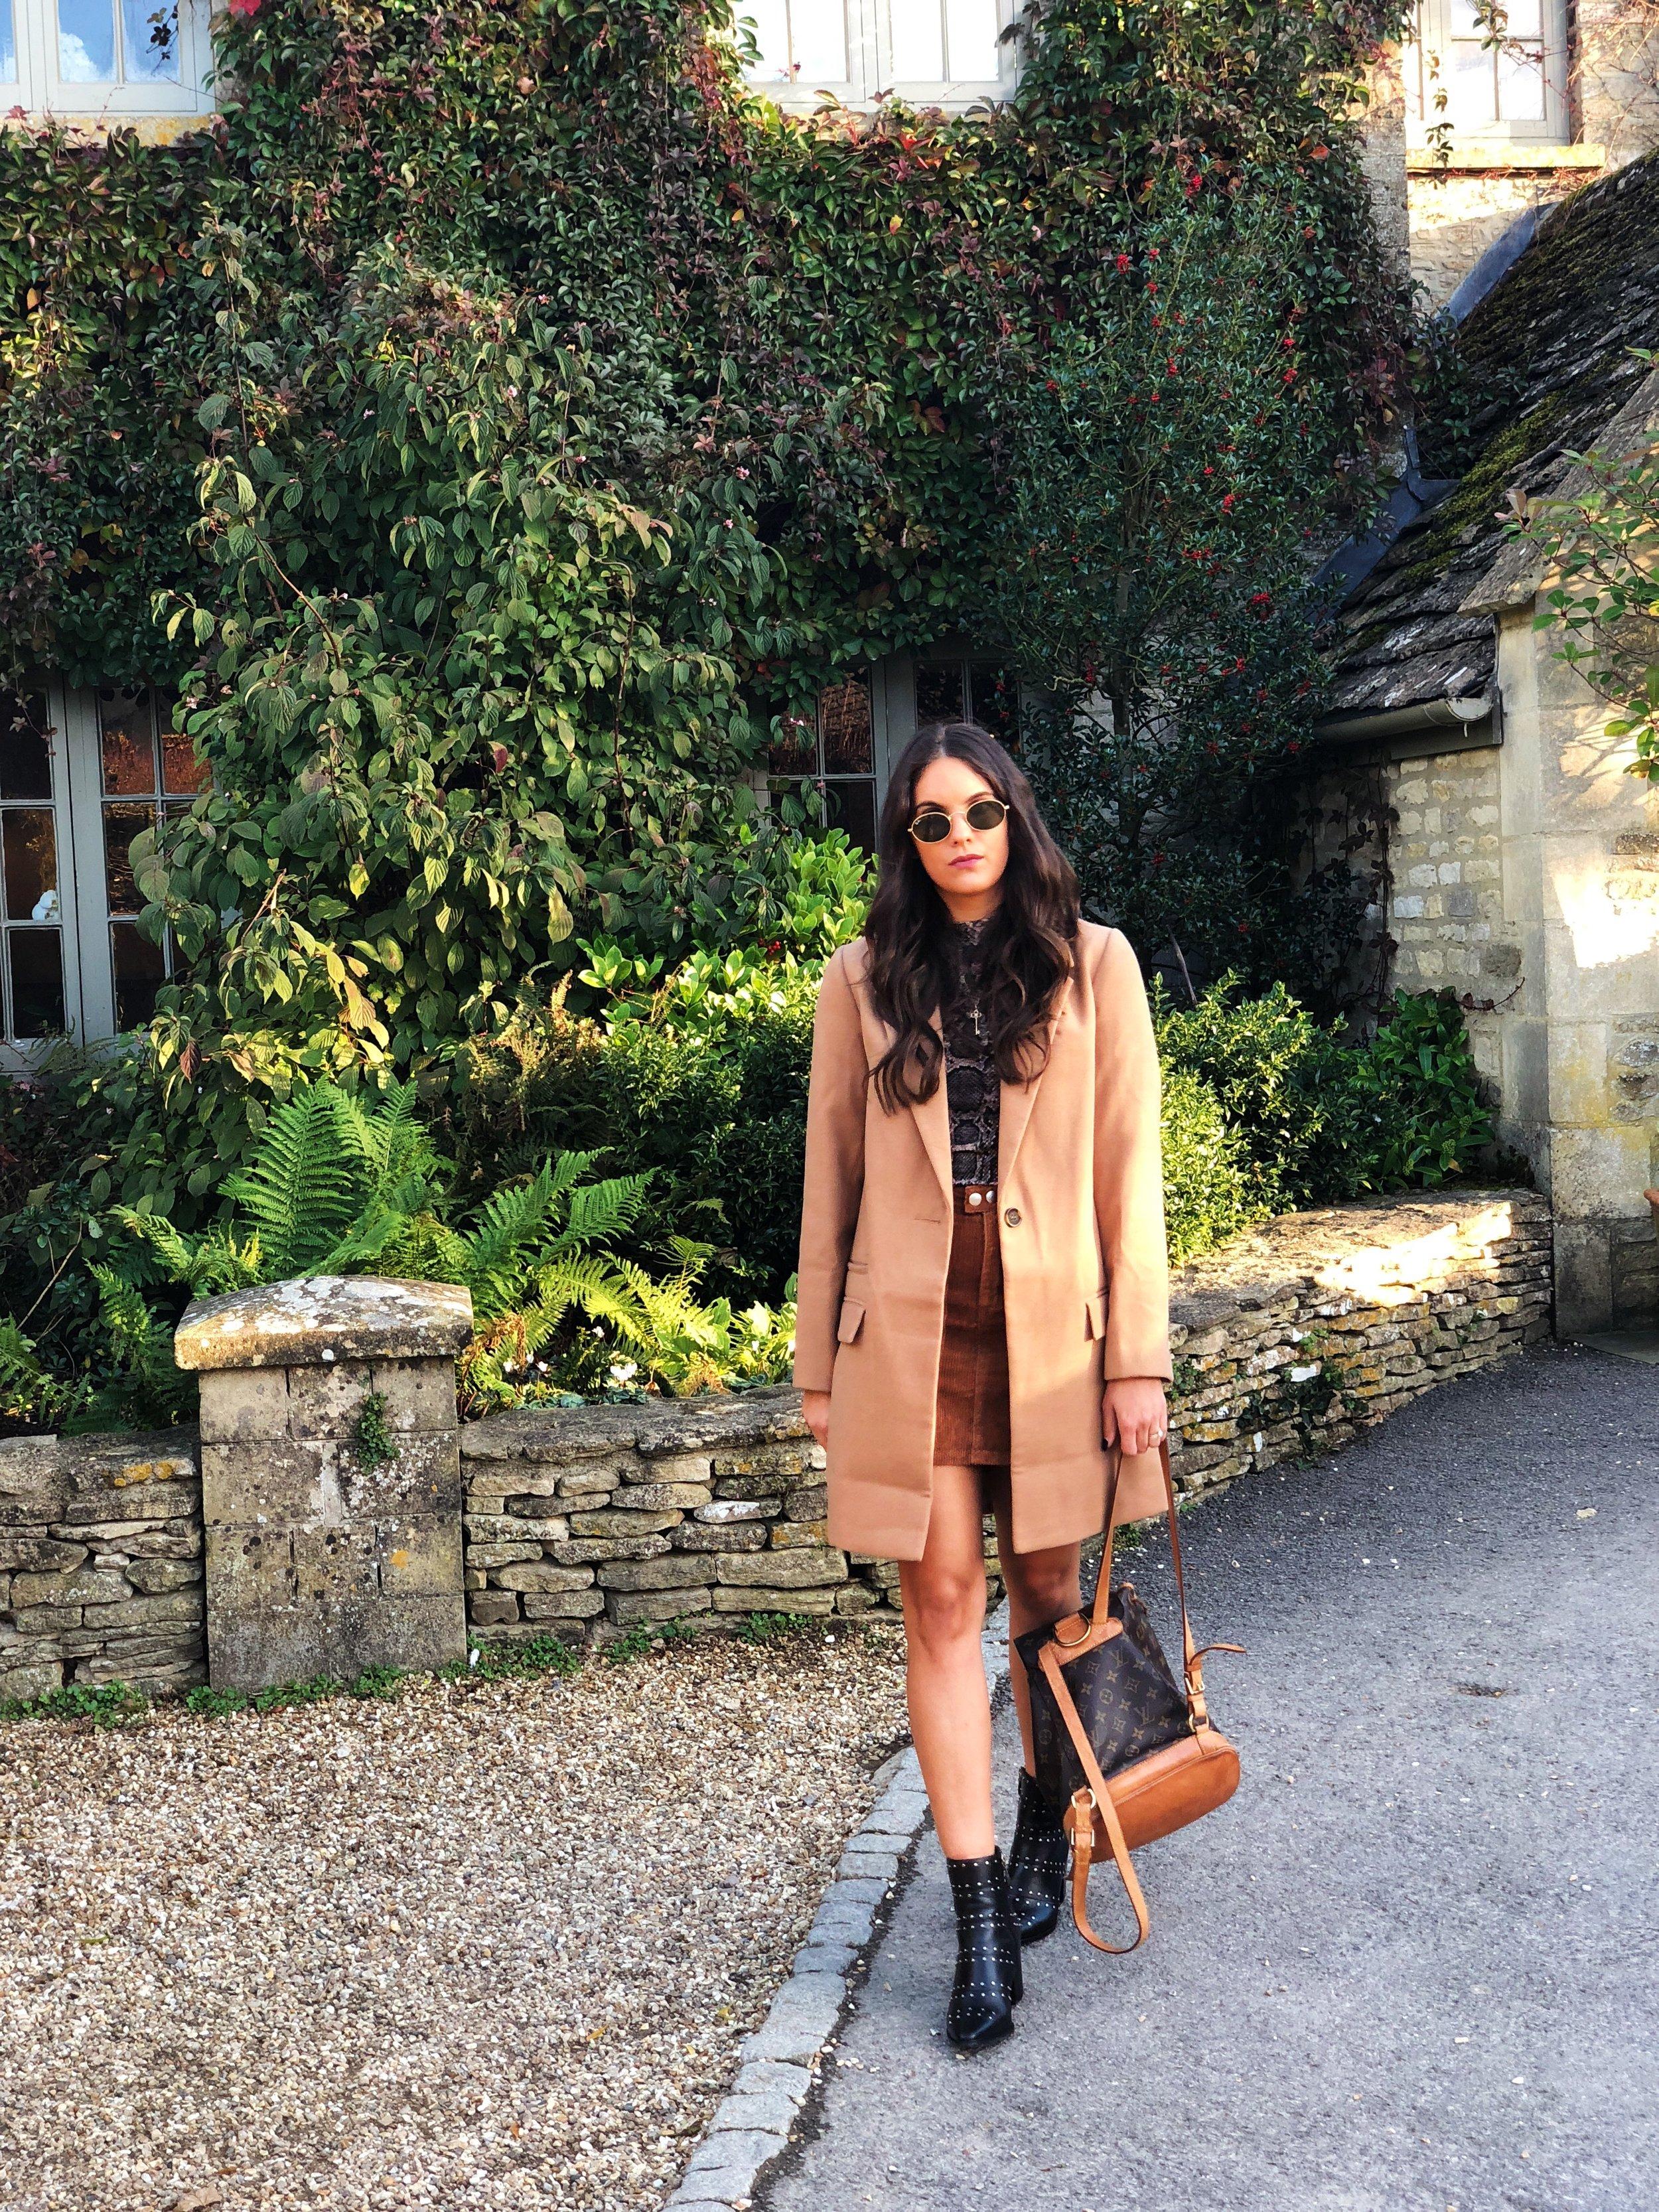 J Wears  Boots -  Dune London    Coat - Missguided    Skirt - Missguided    Top - Zara    Sunglasses - Rayban    Bag - Louis Vuitton